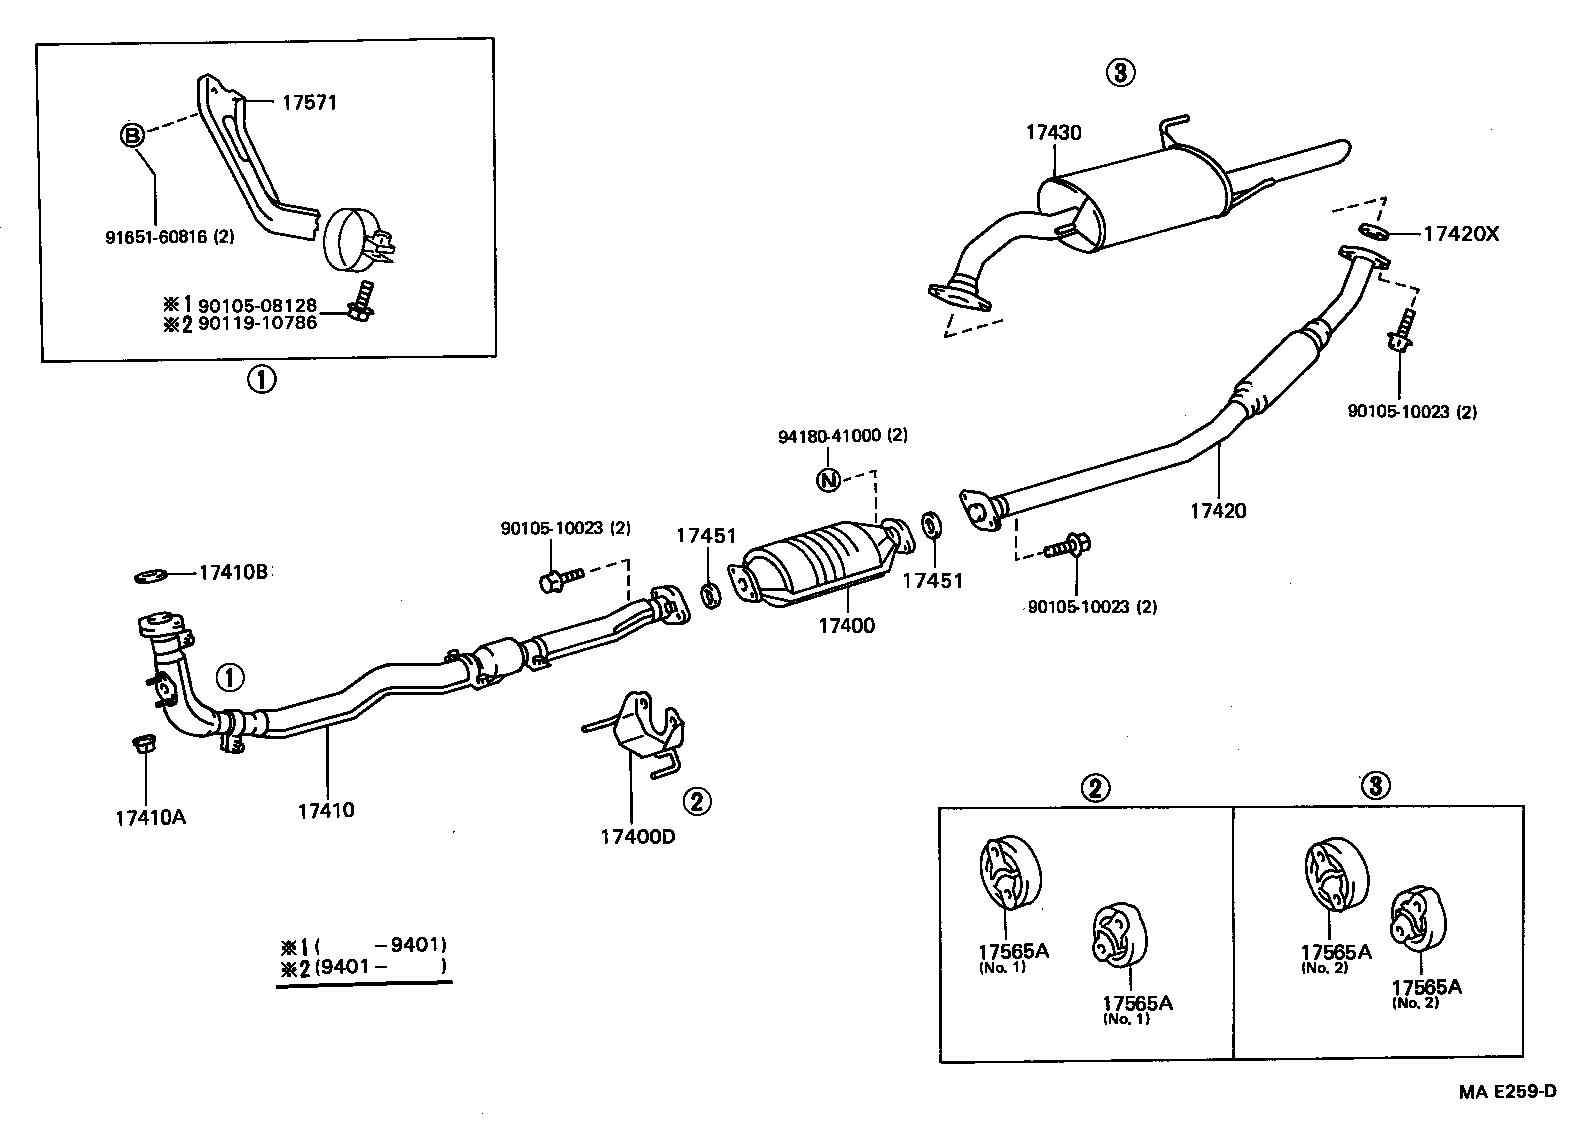 1995 toyota tercel engine diagram uss constitution parts diagrams free